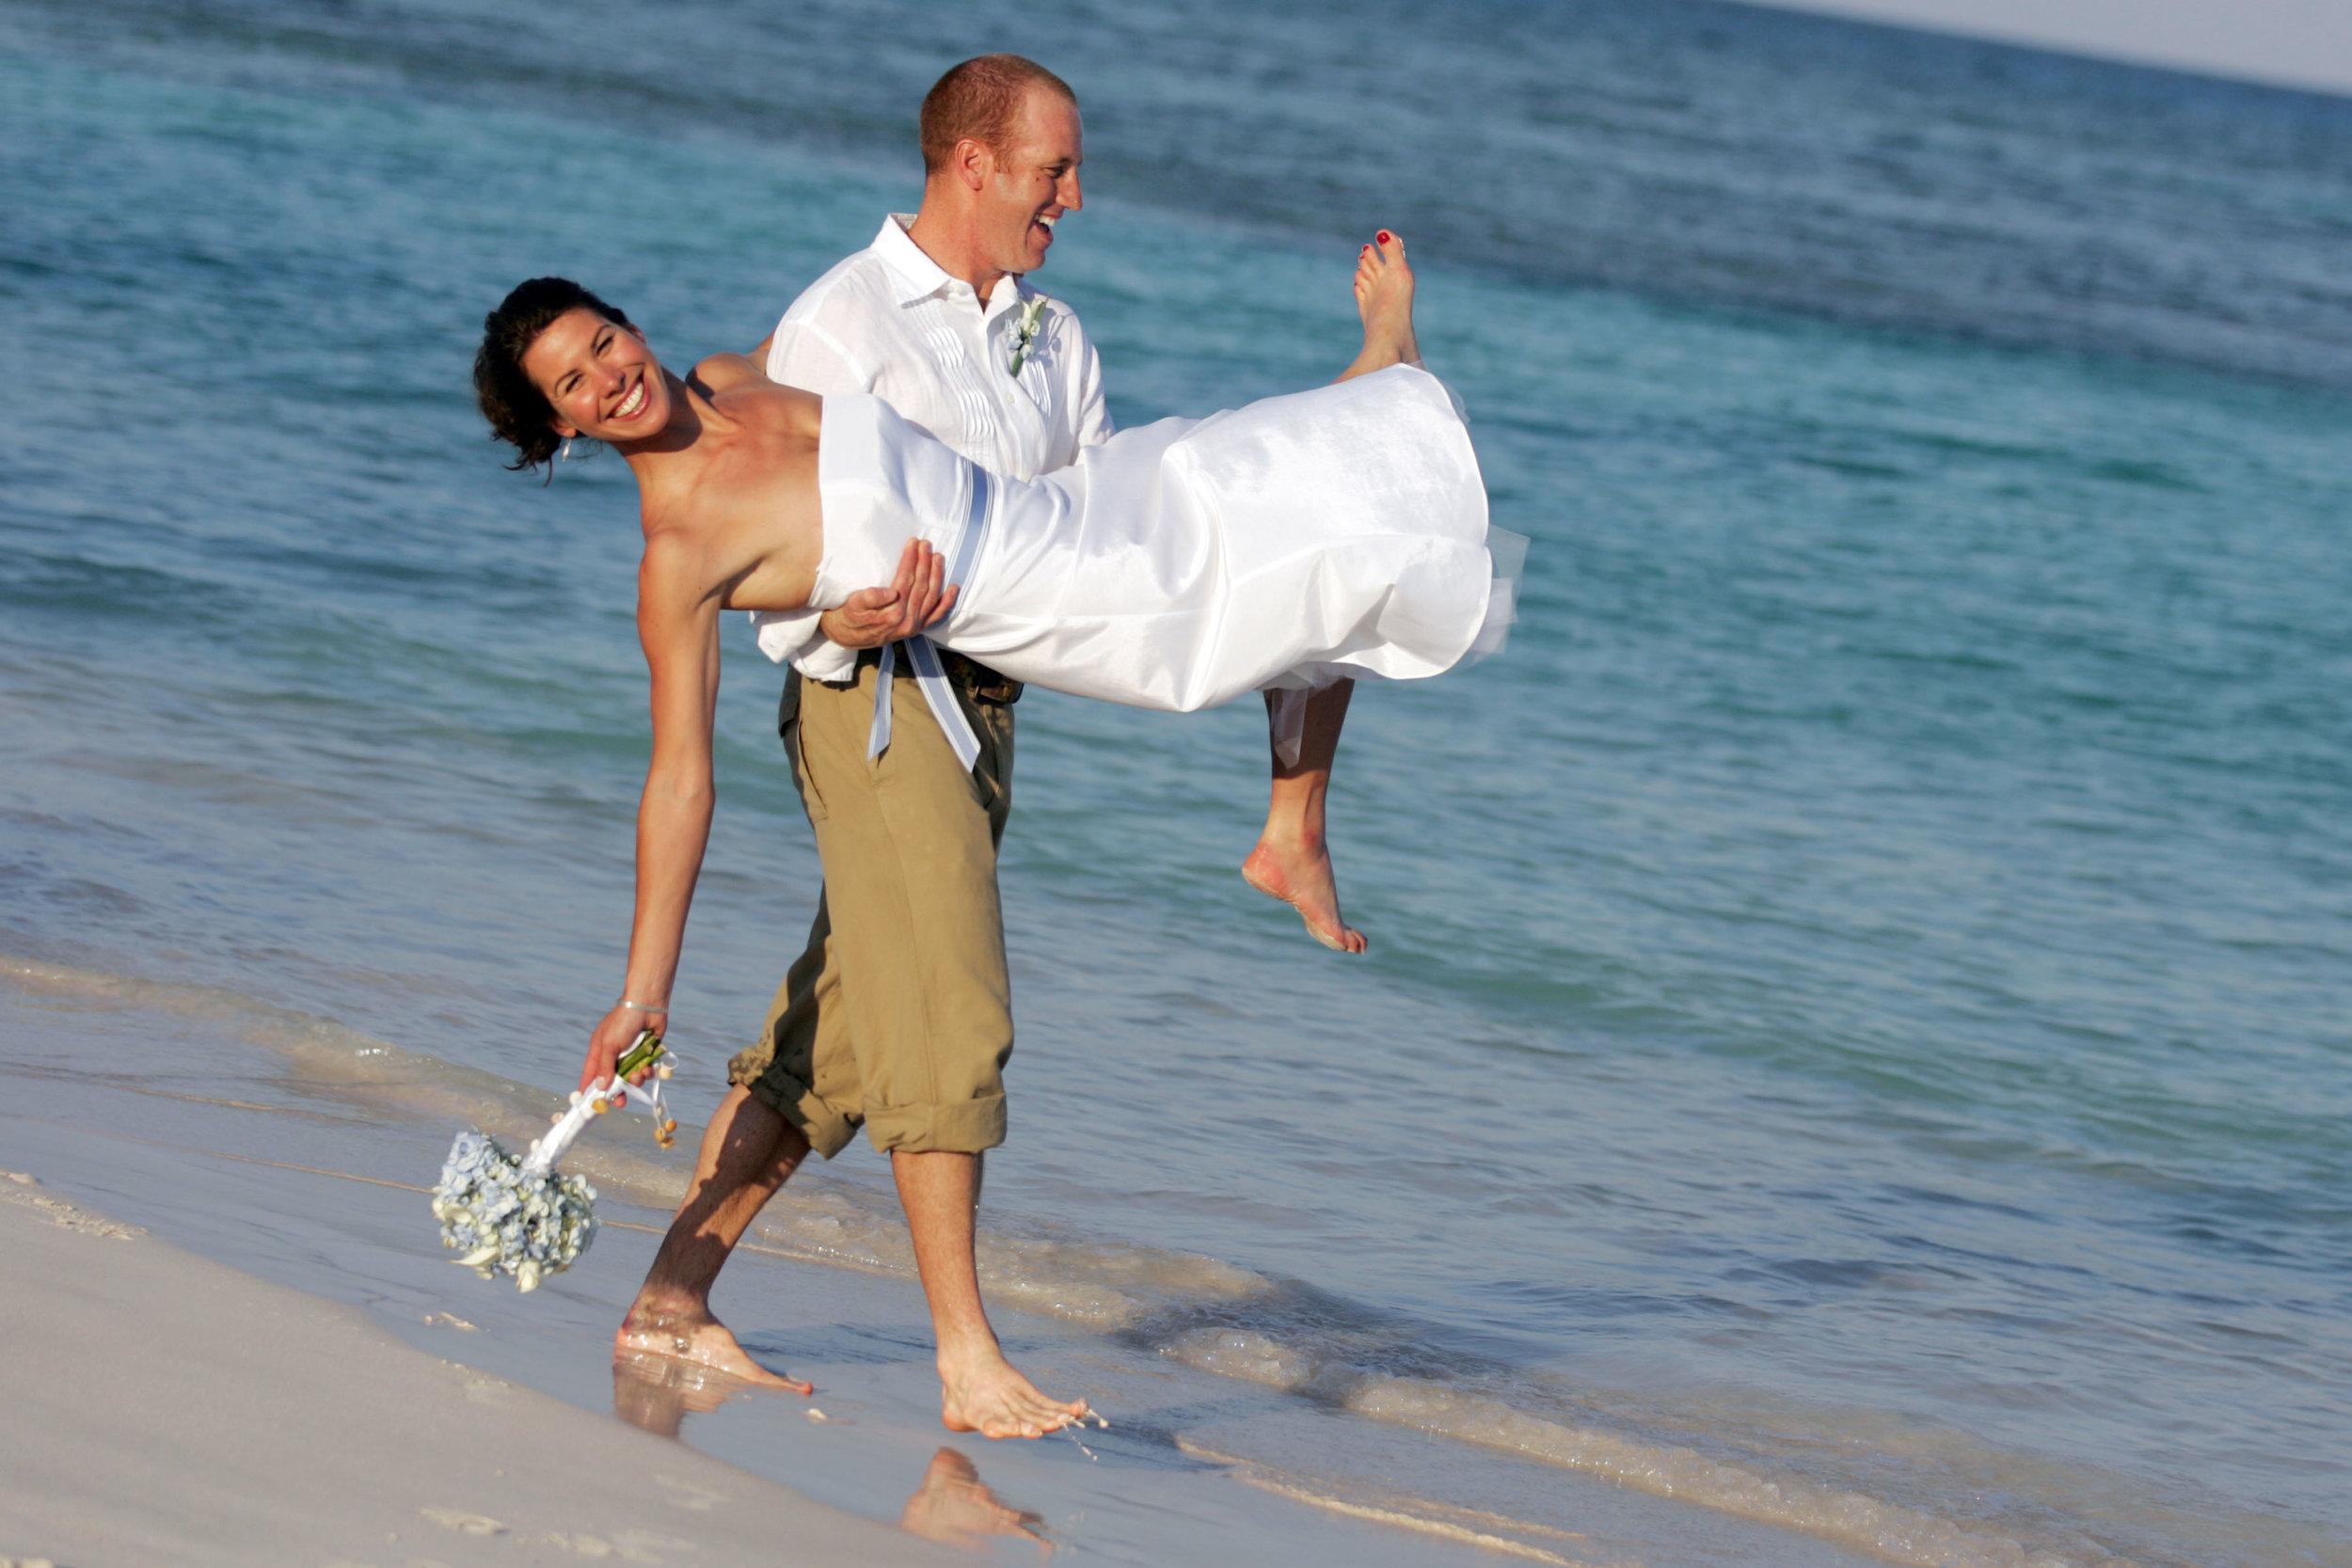 destination-wedding-photographer-axelphoto.jpg